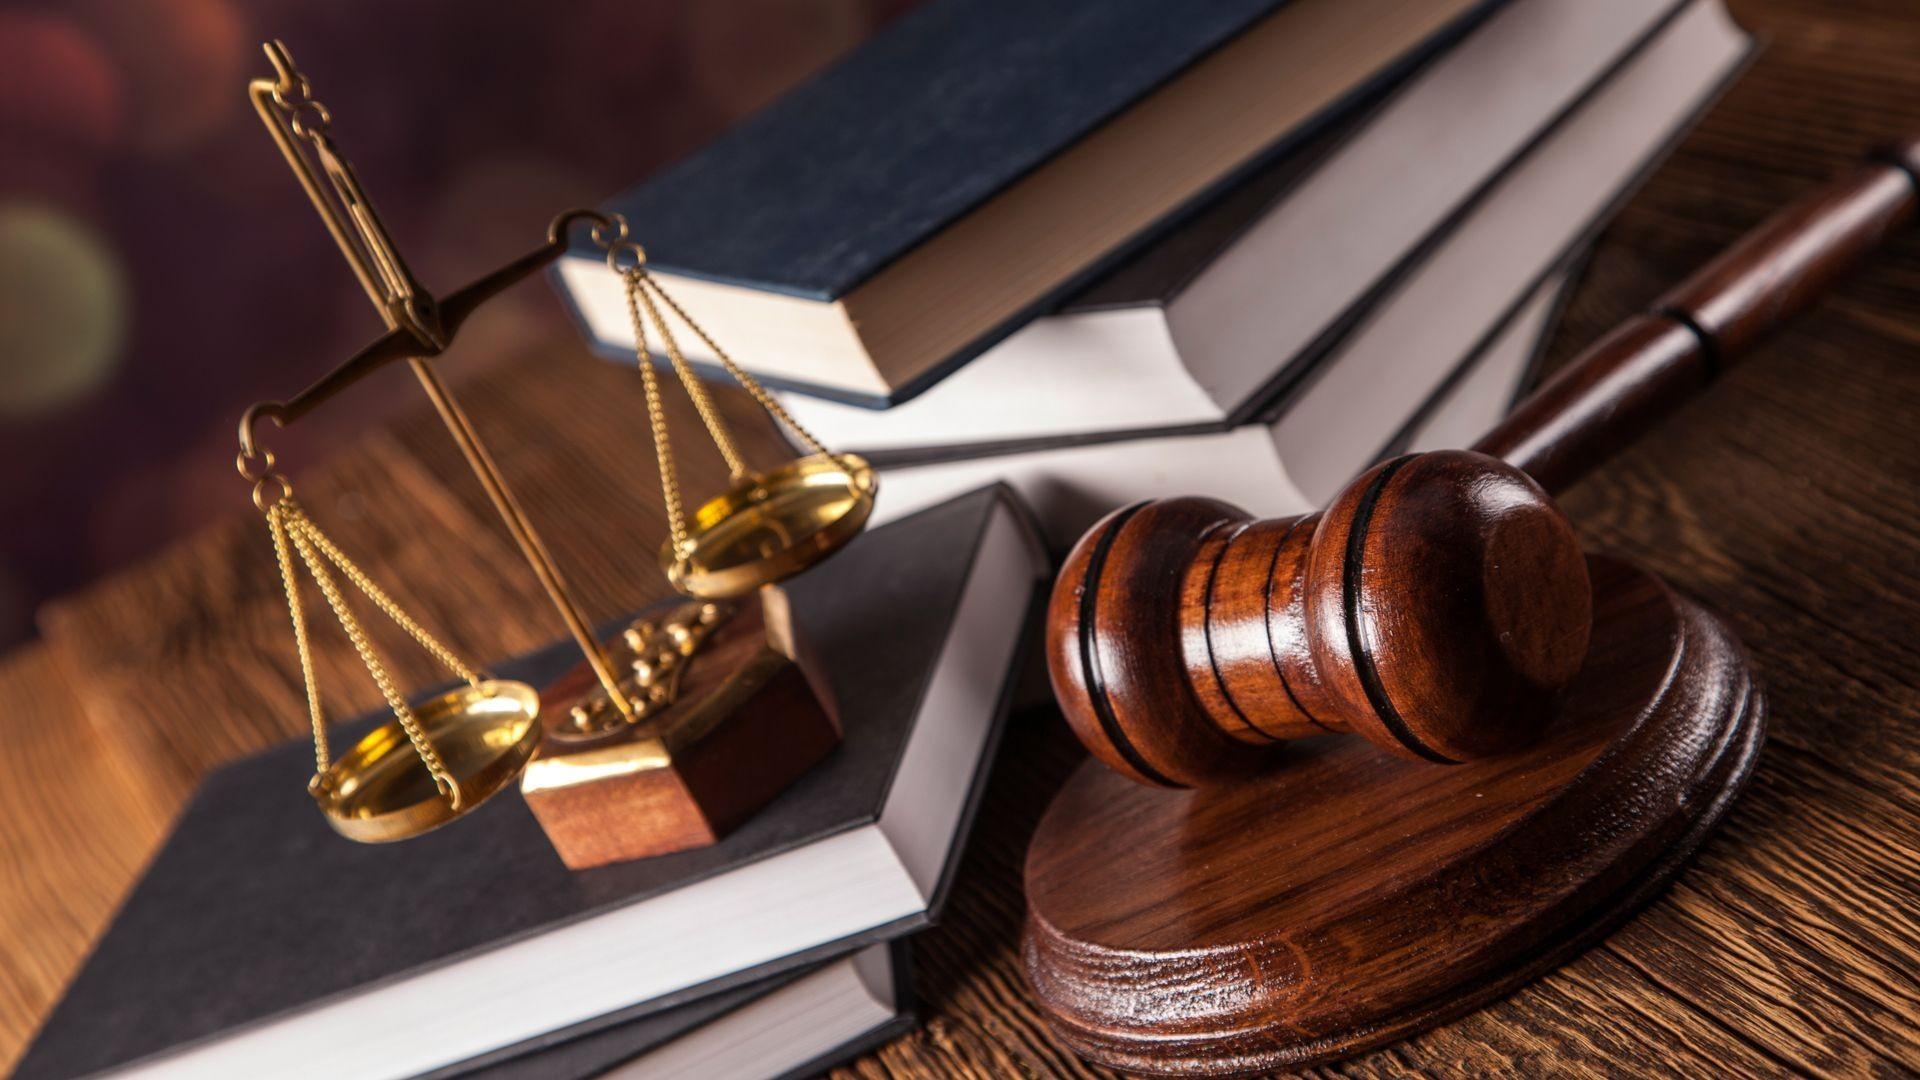 000 abogados justicia derecho mazo balanza